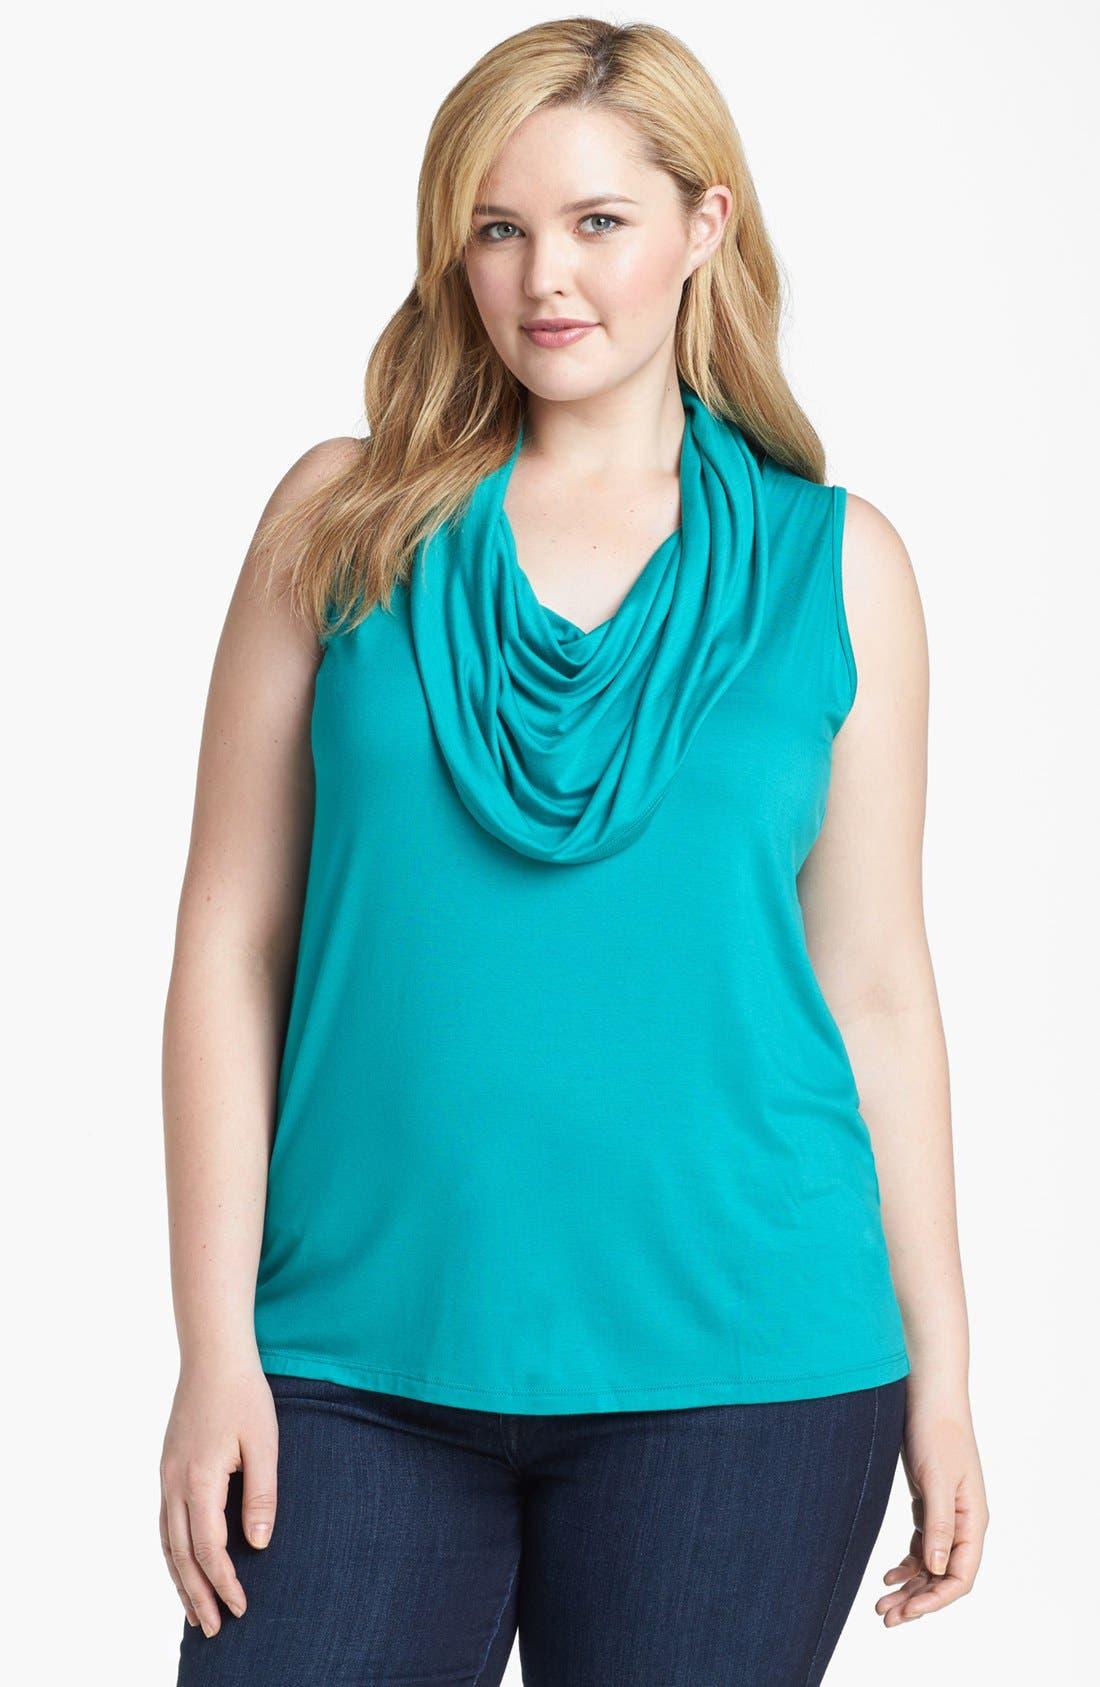 Alternate Image 1 Selected - Karen Kane Sleeveless Cowl Neck Top (Plus Size)